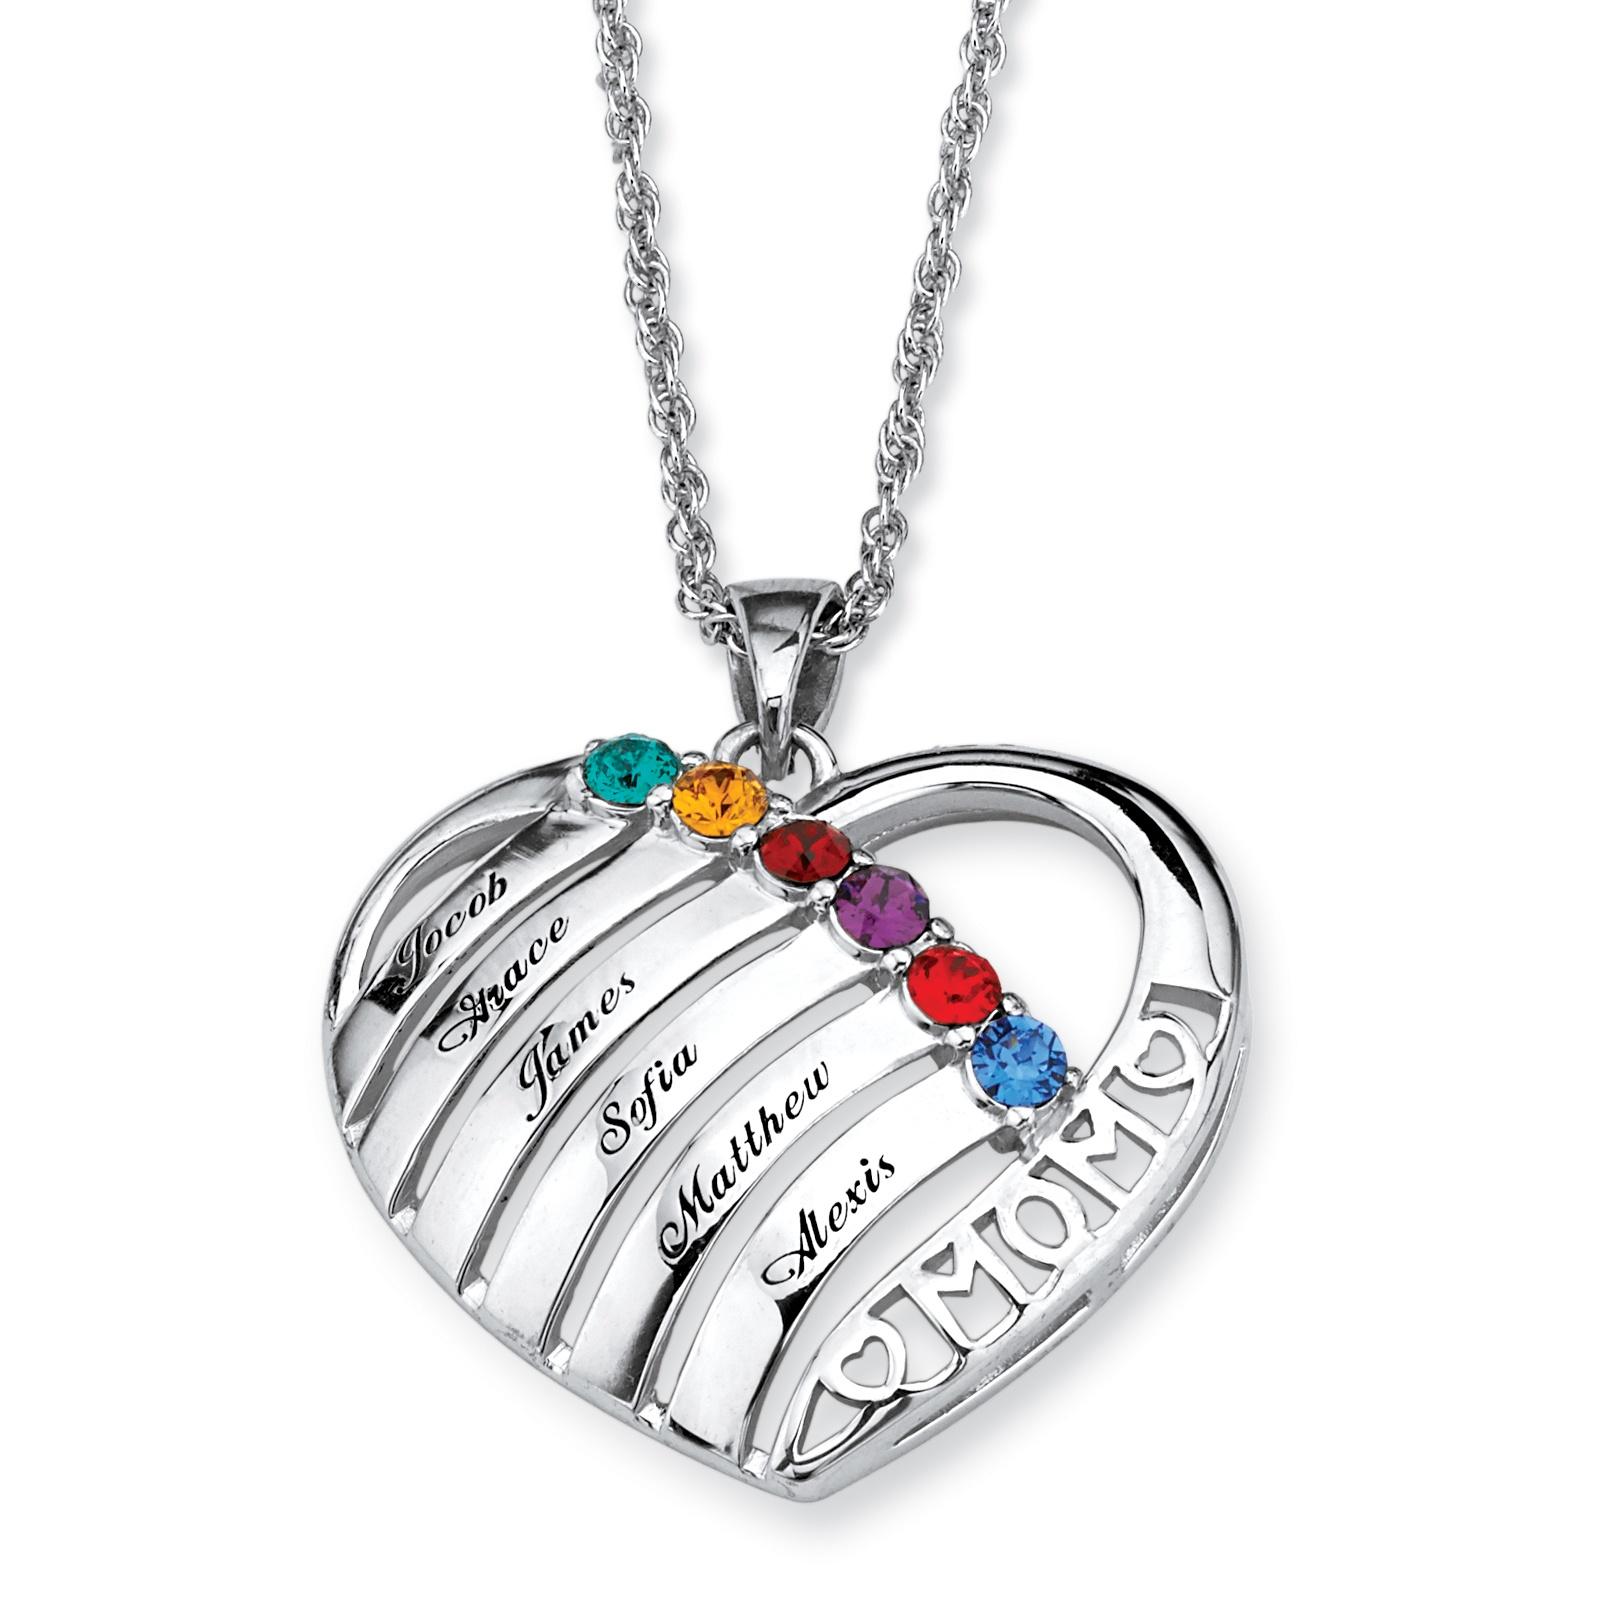 Personalized birthstone mom necklace in silvertone at palmbeach jewelry aloadofball Gallery